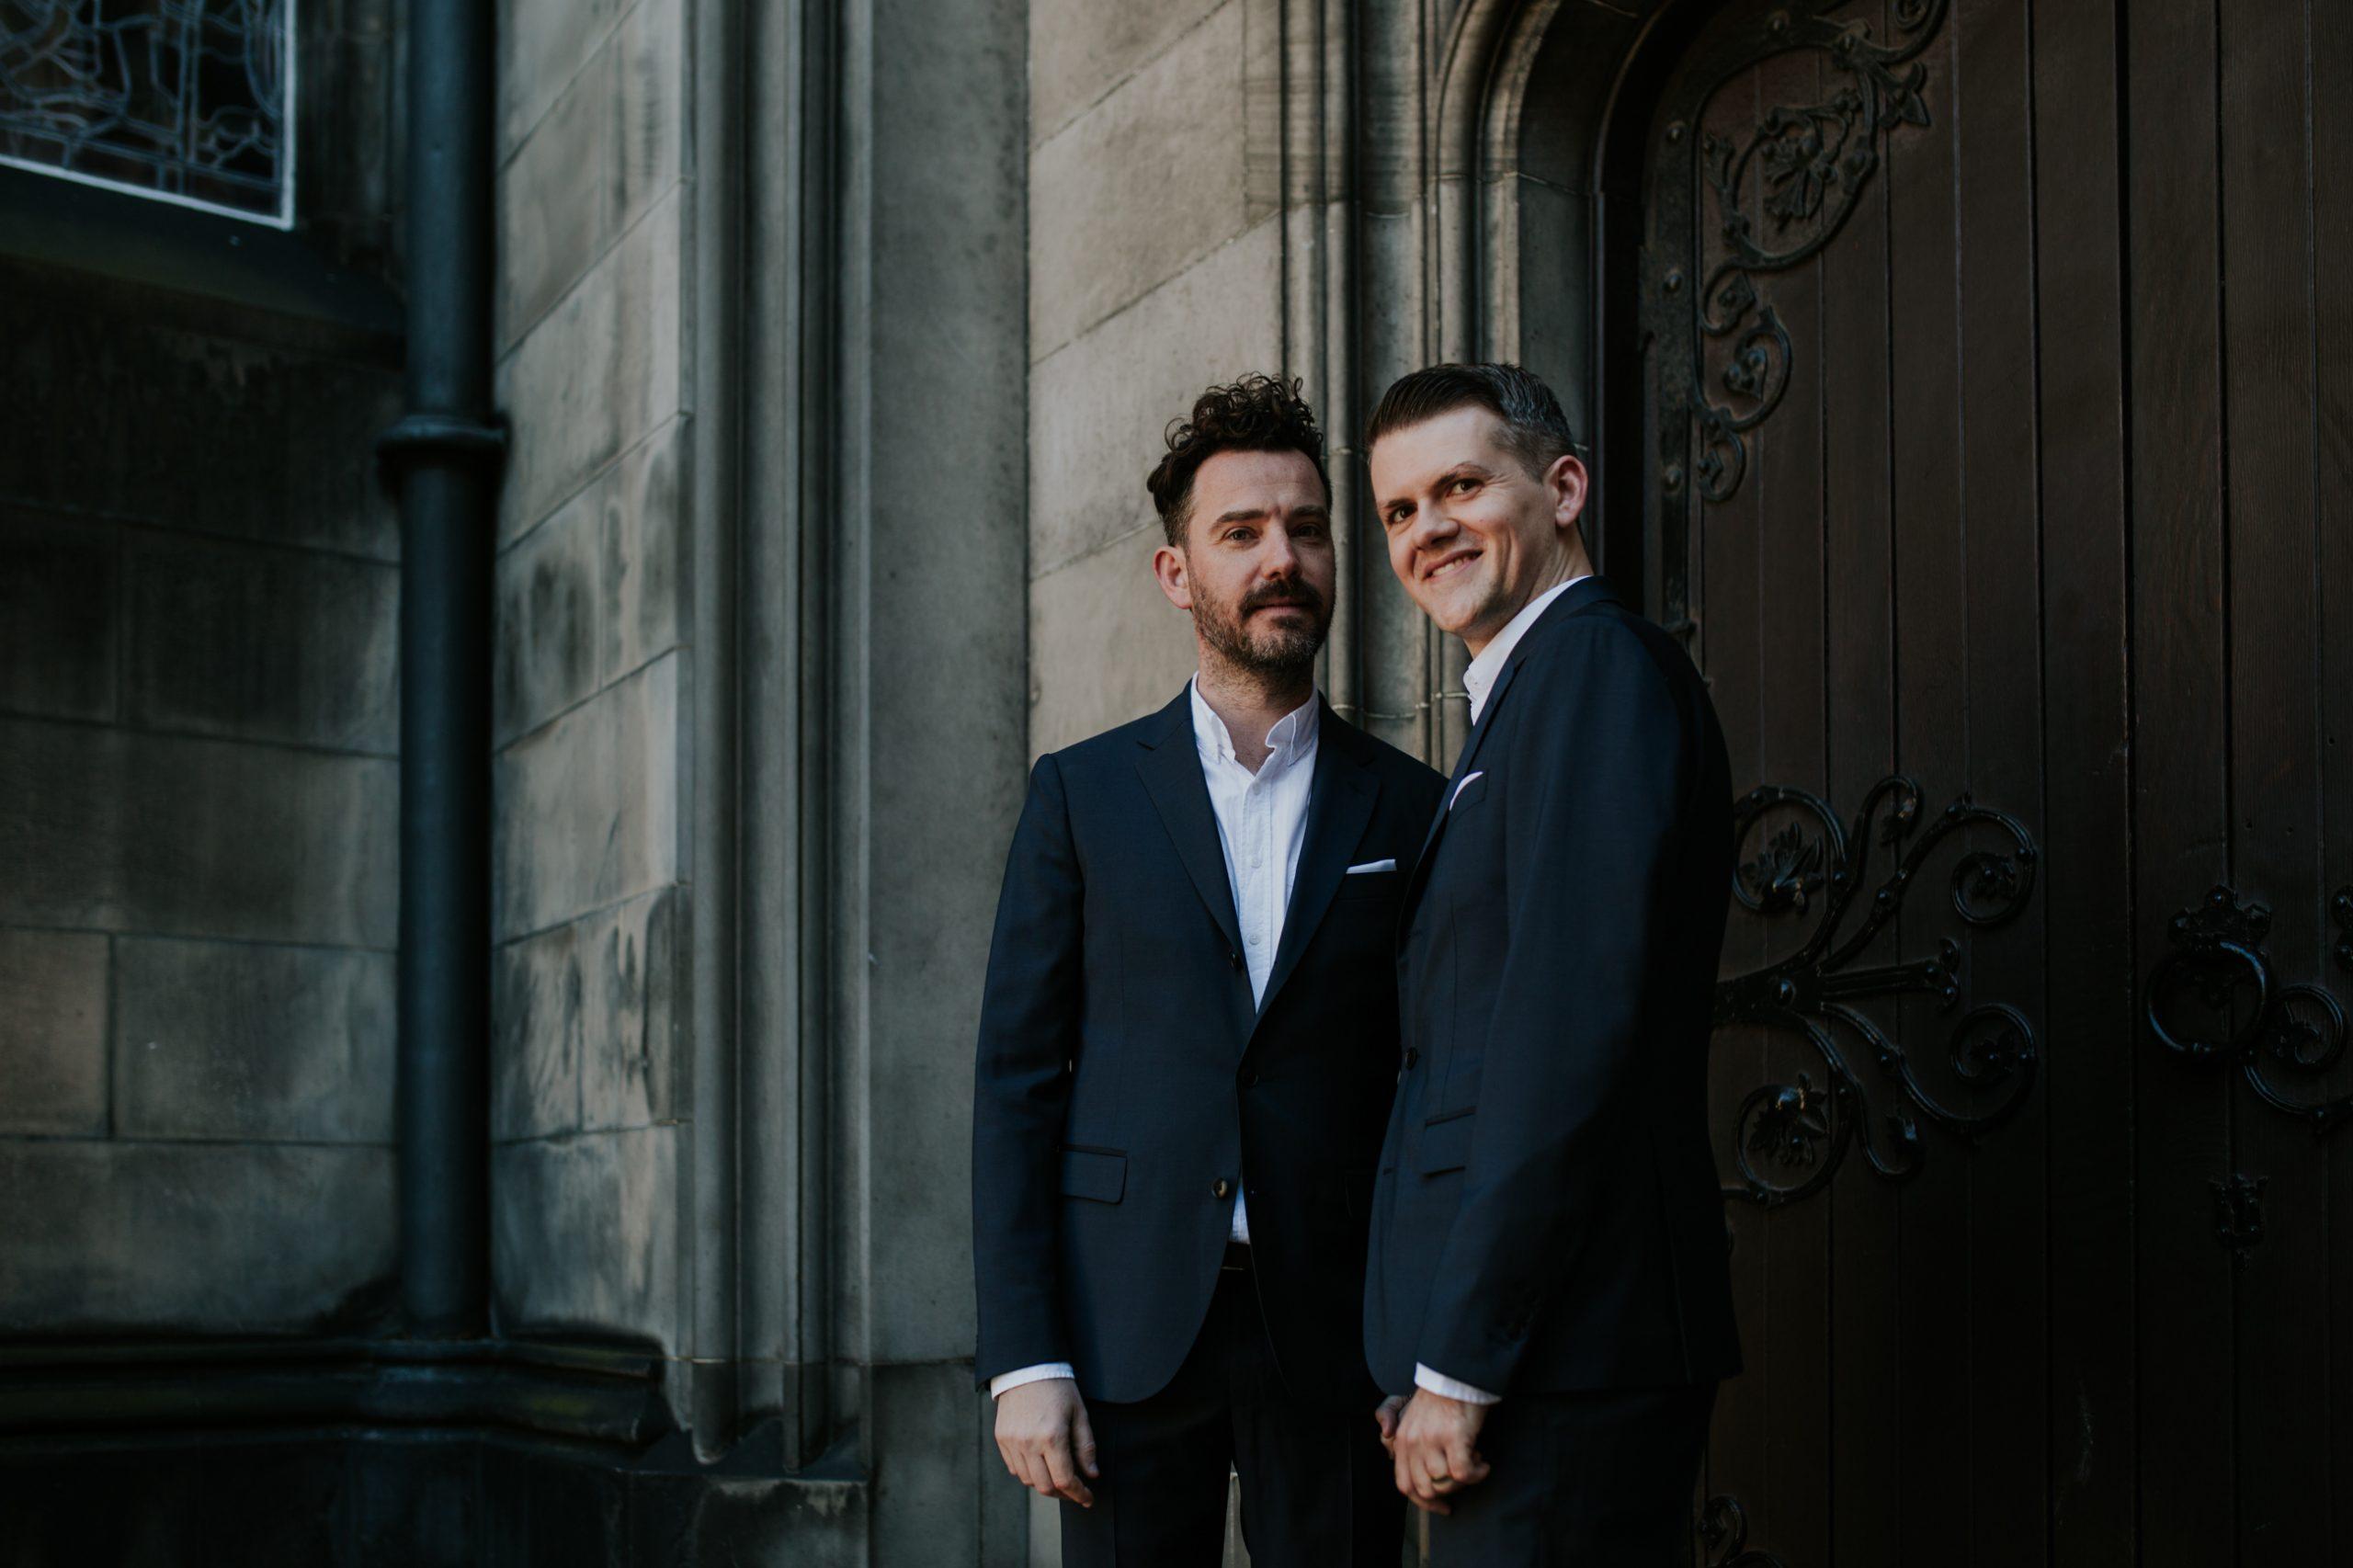 edinburgh-seme-sex-lgbtq-wedding-photographer-scotland